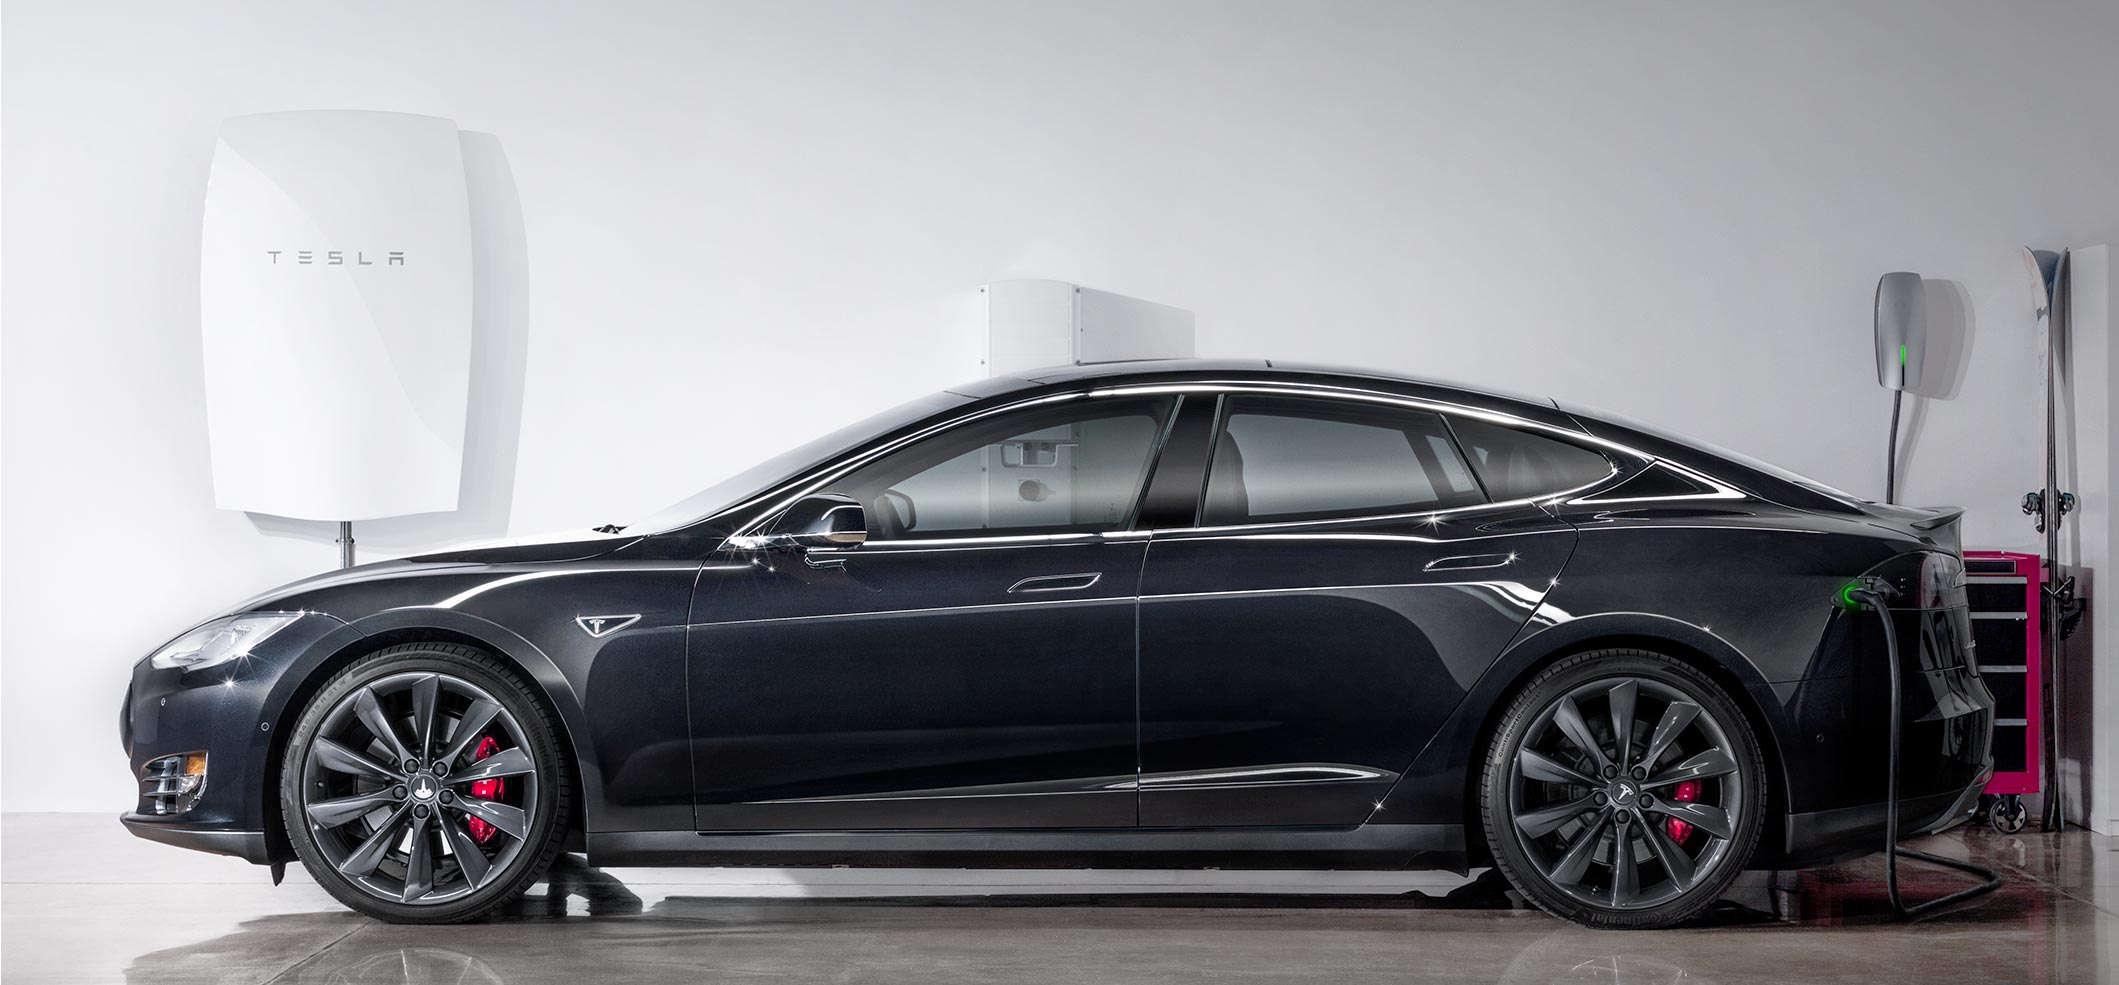 Kaynak: Tesla